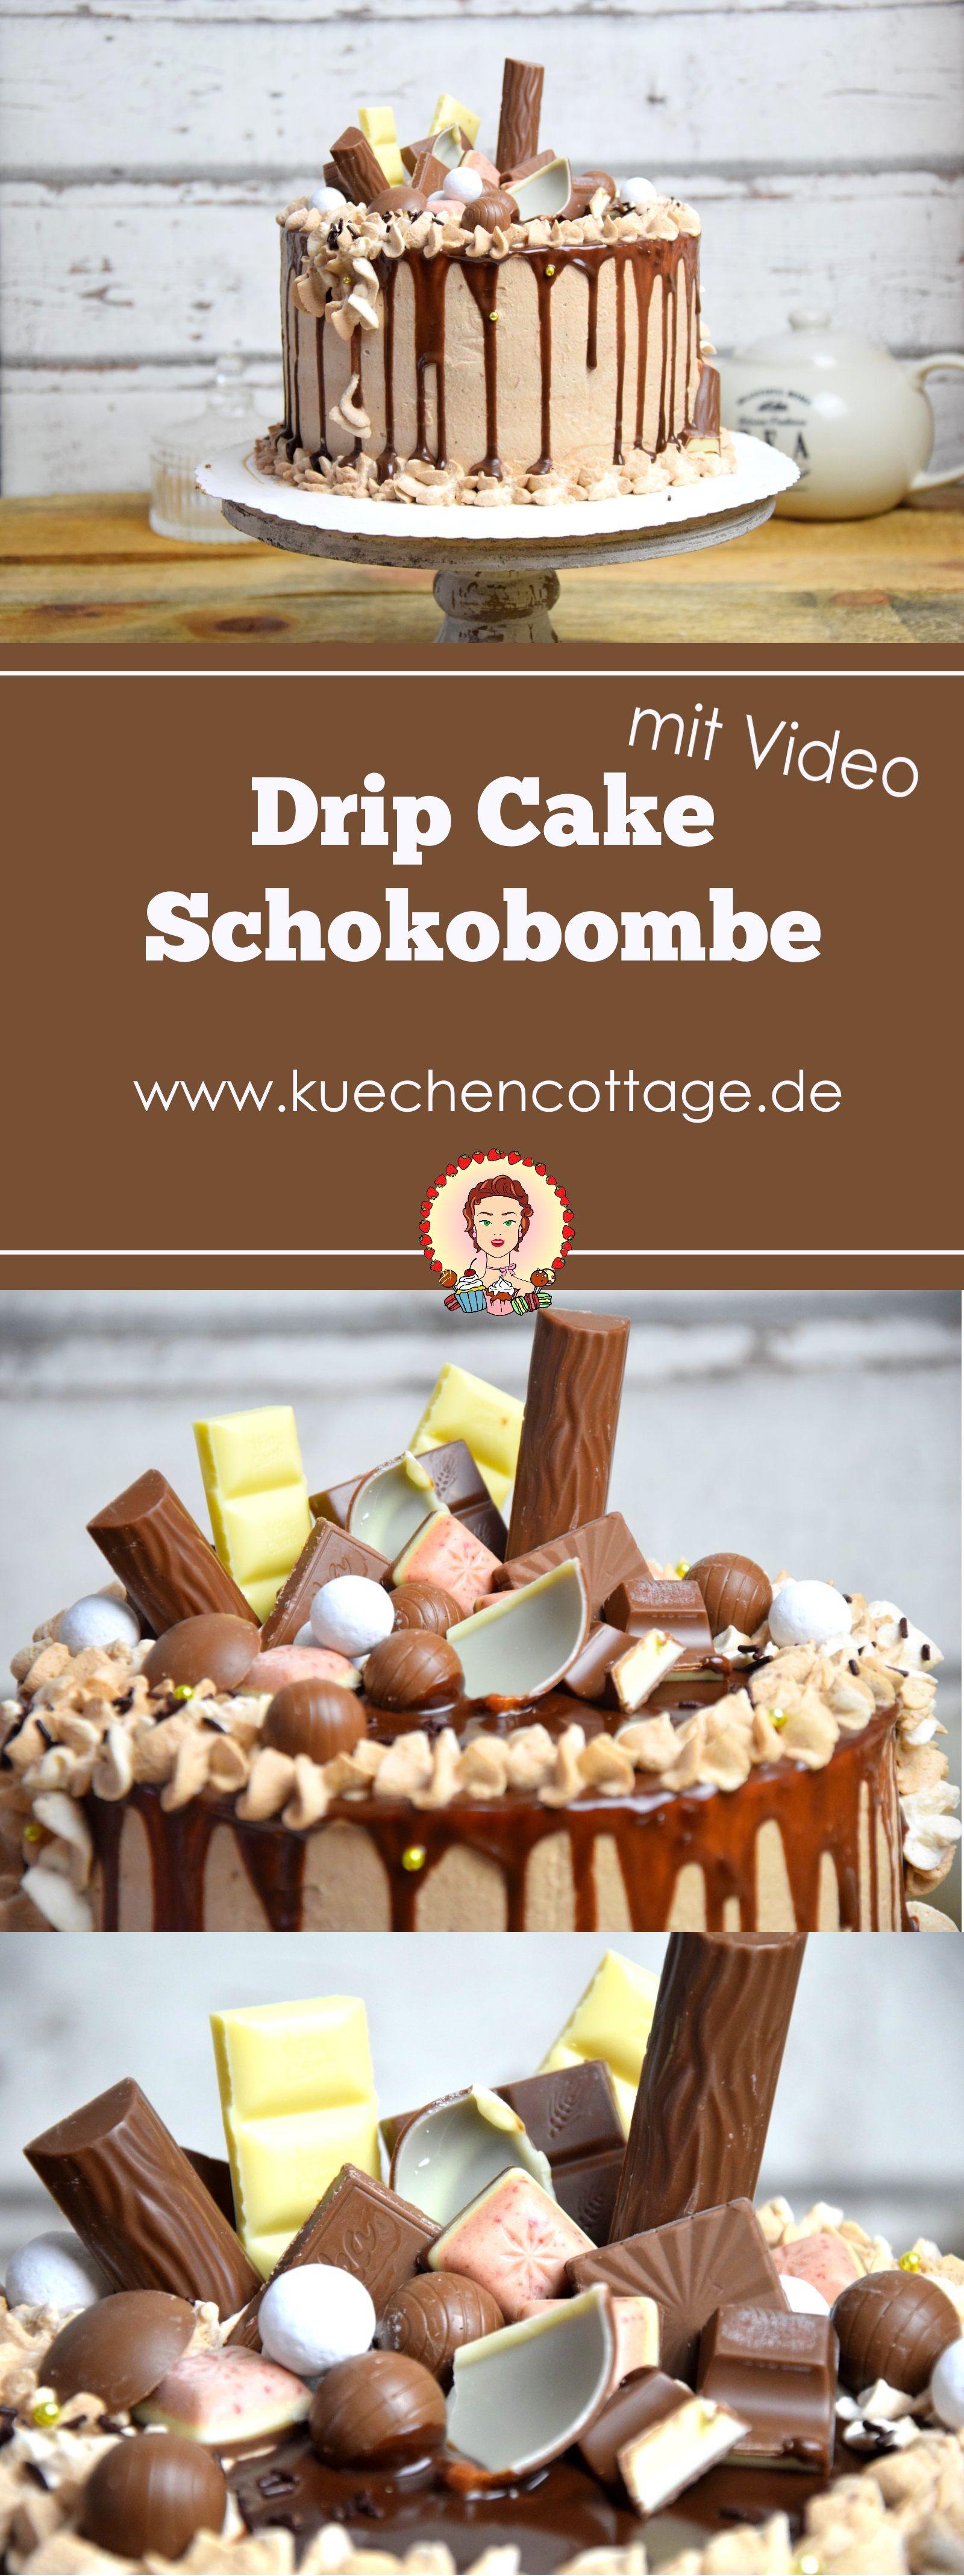 Drip Cake Schokobombe #cakedesigns